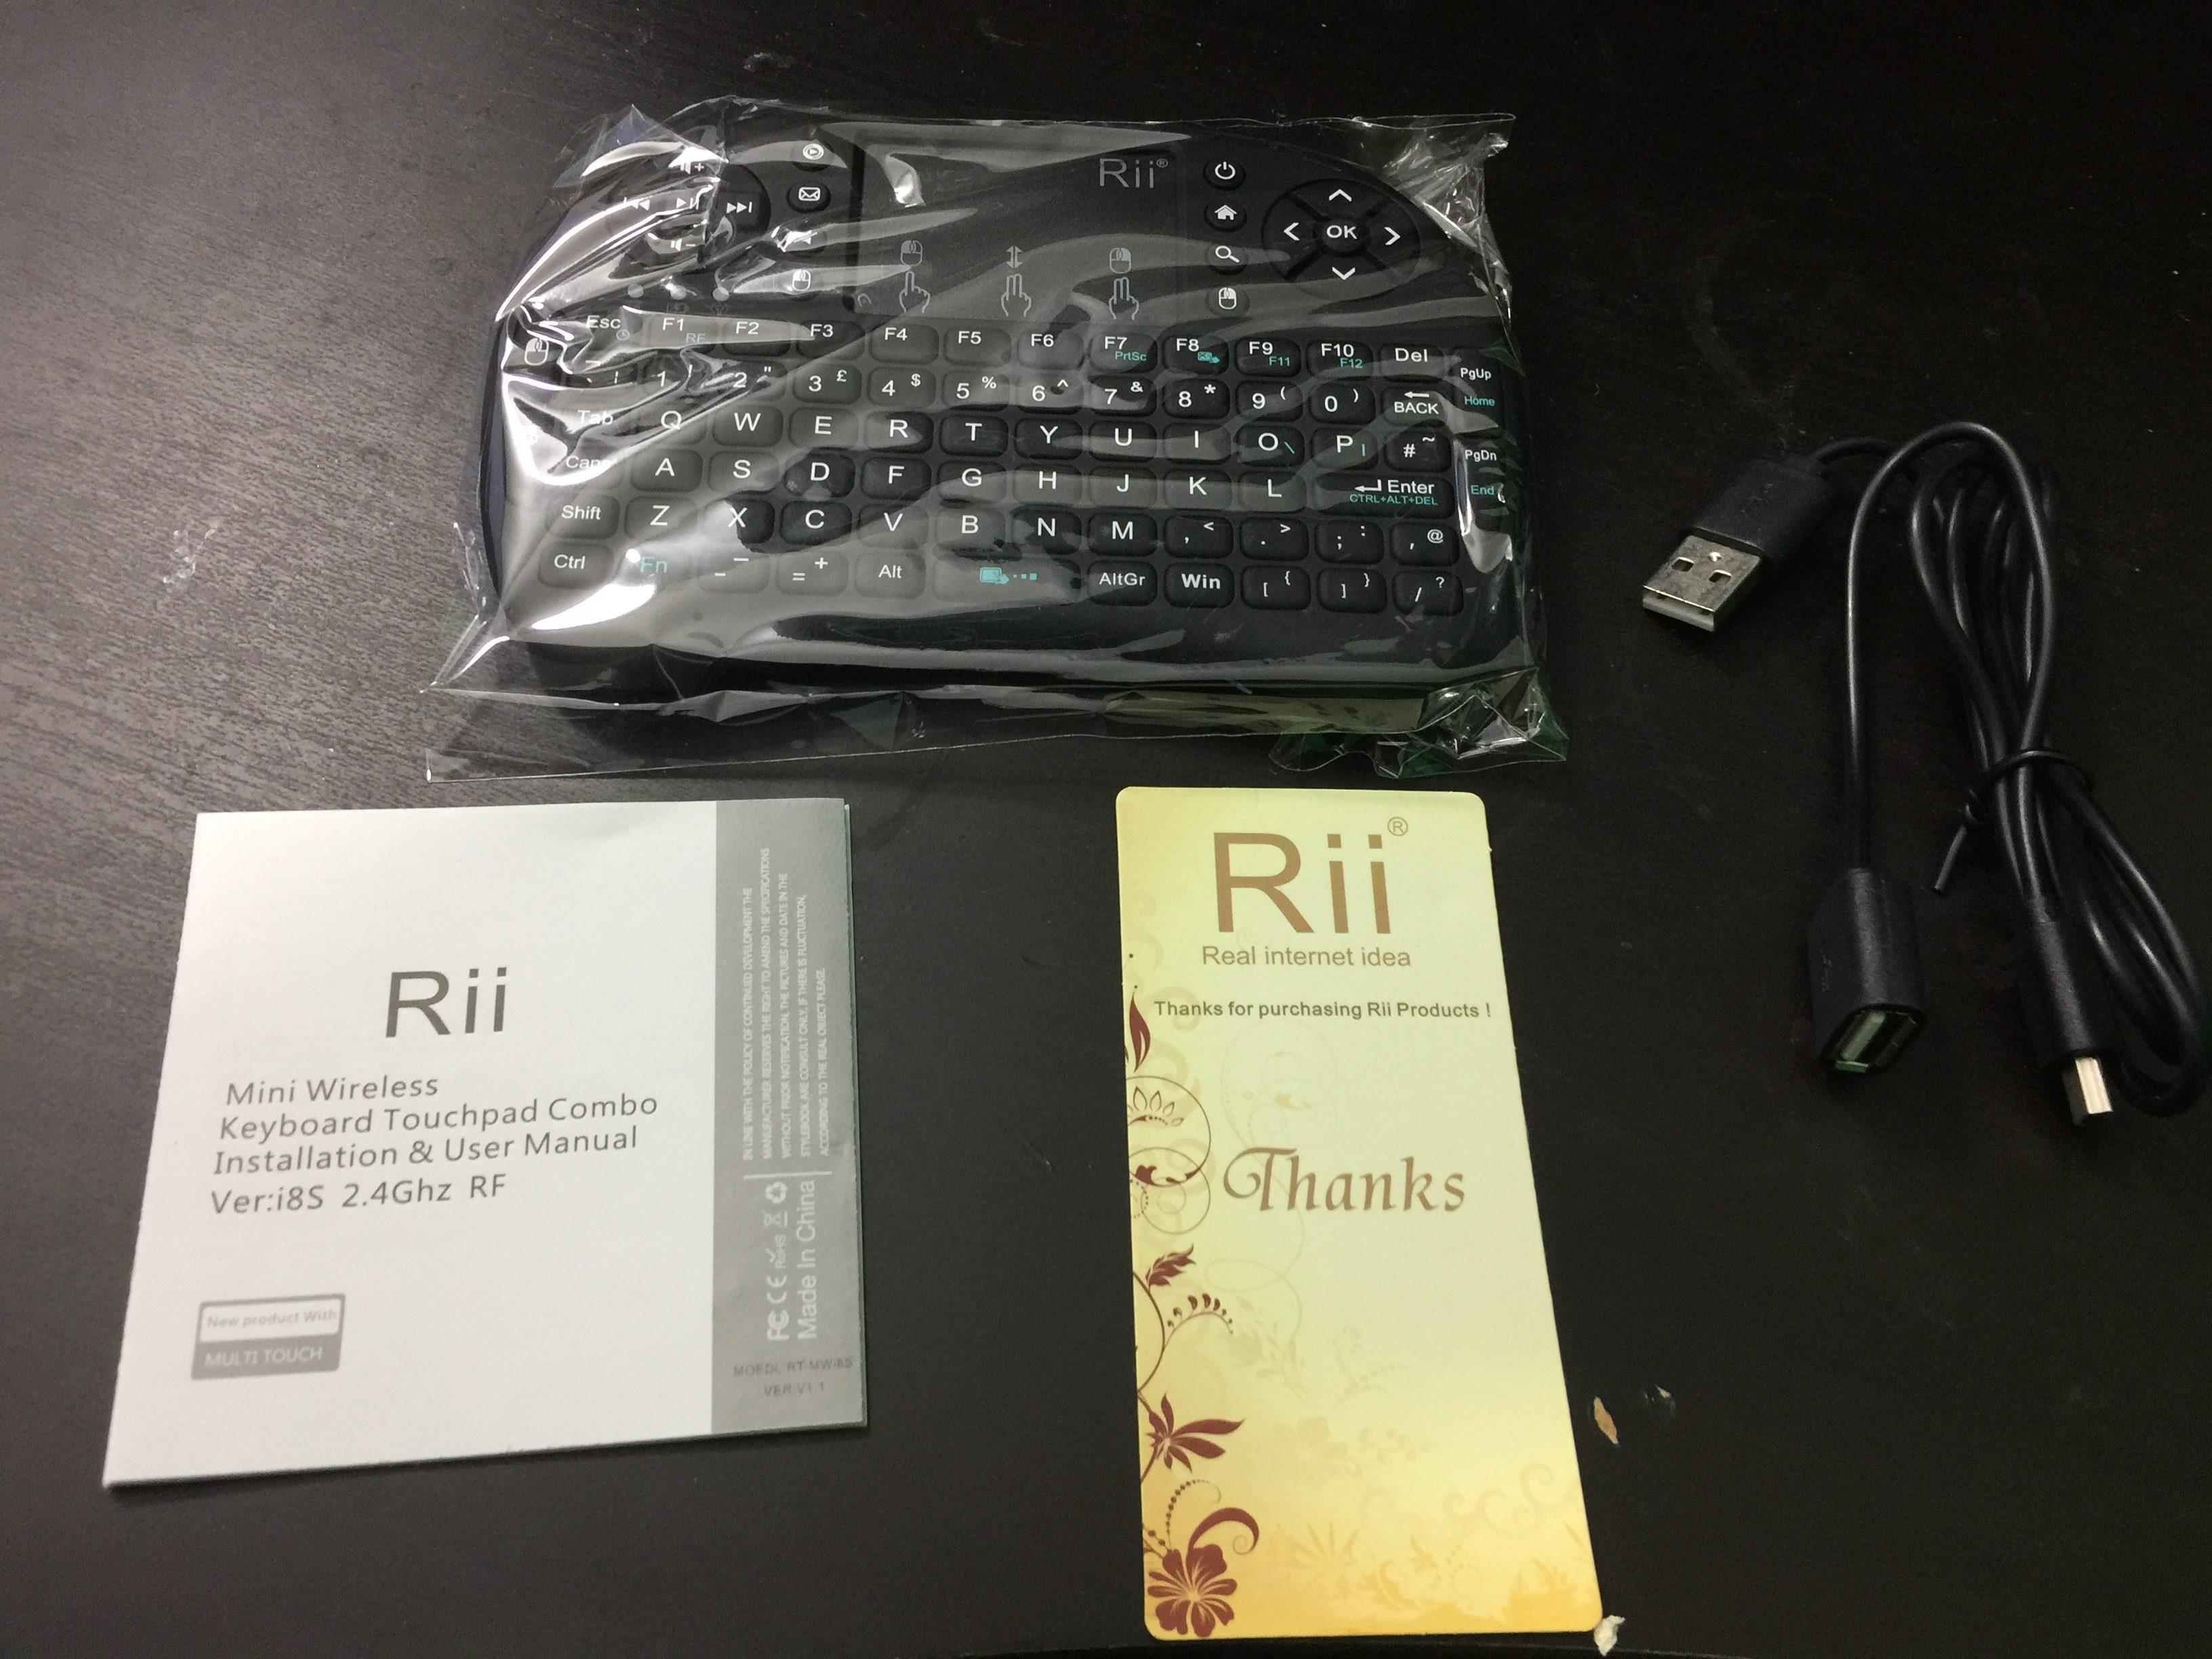 RII MINI I8+ I8s USB WIRELESS KEYBOARD REVIEW VIDEO FOR WINDOWS